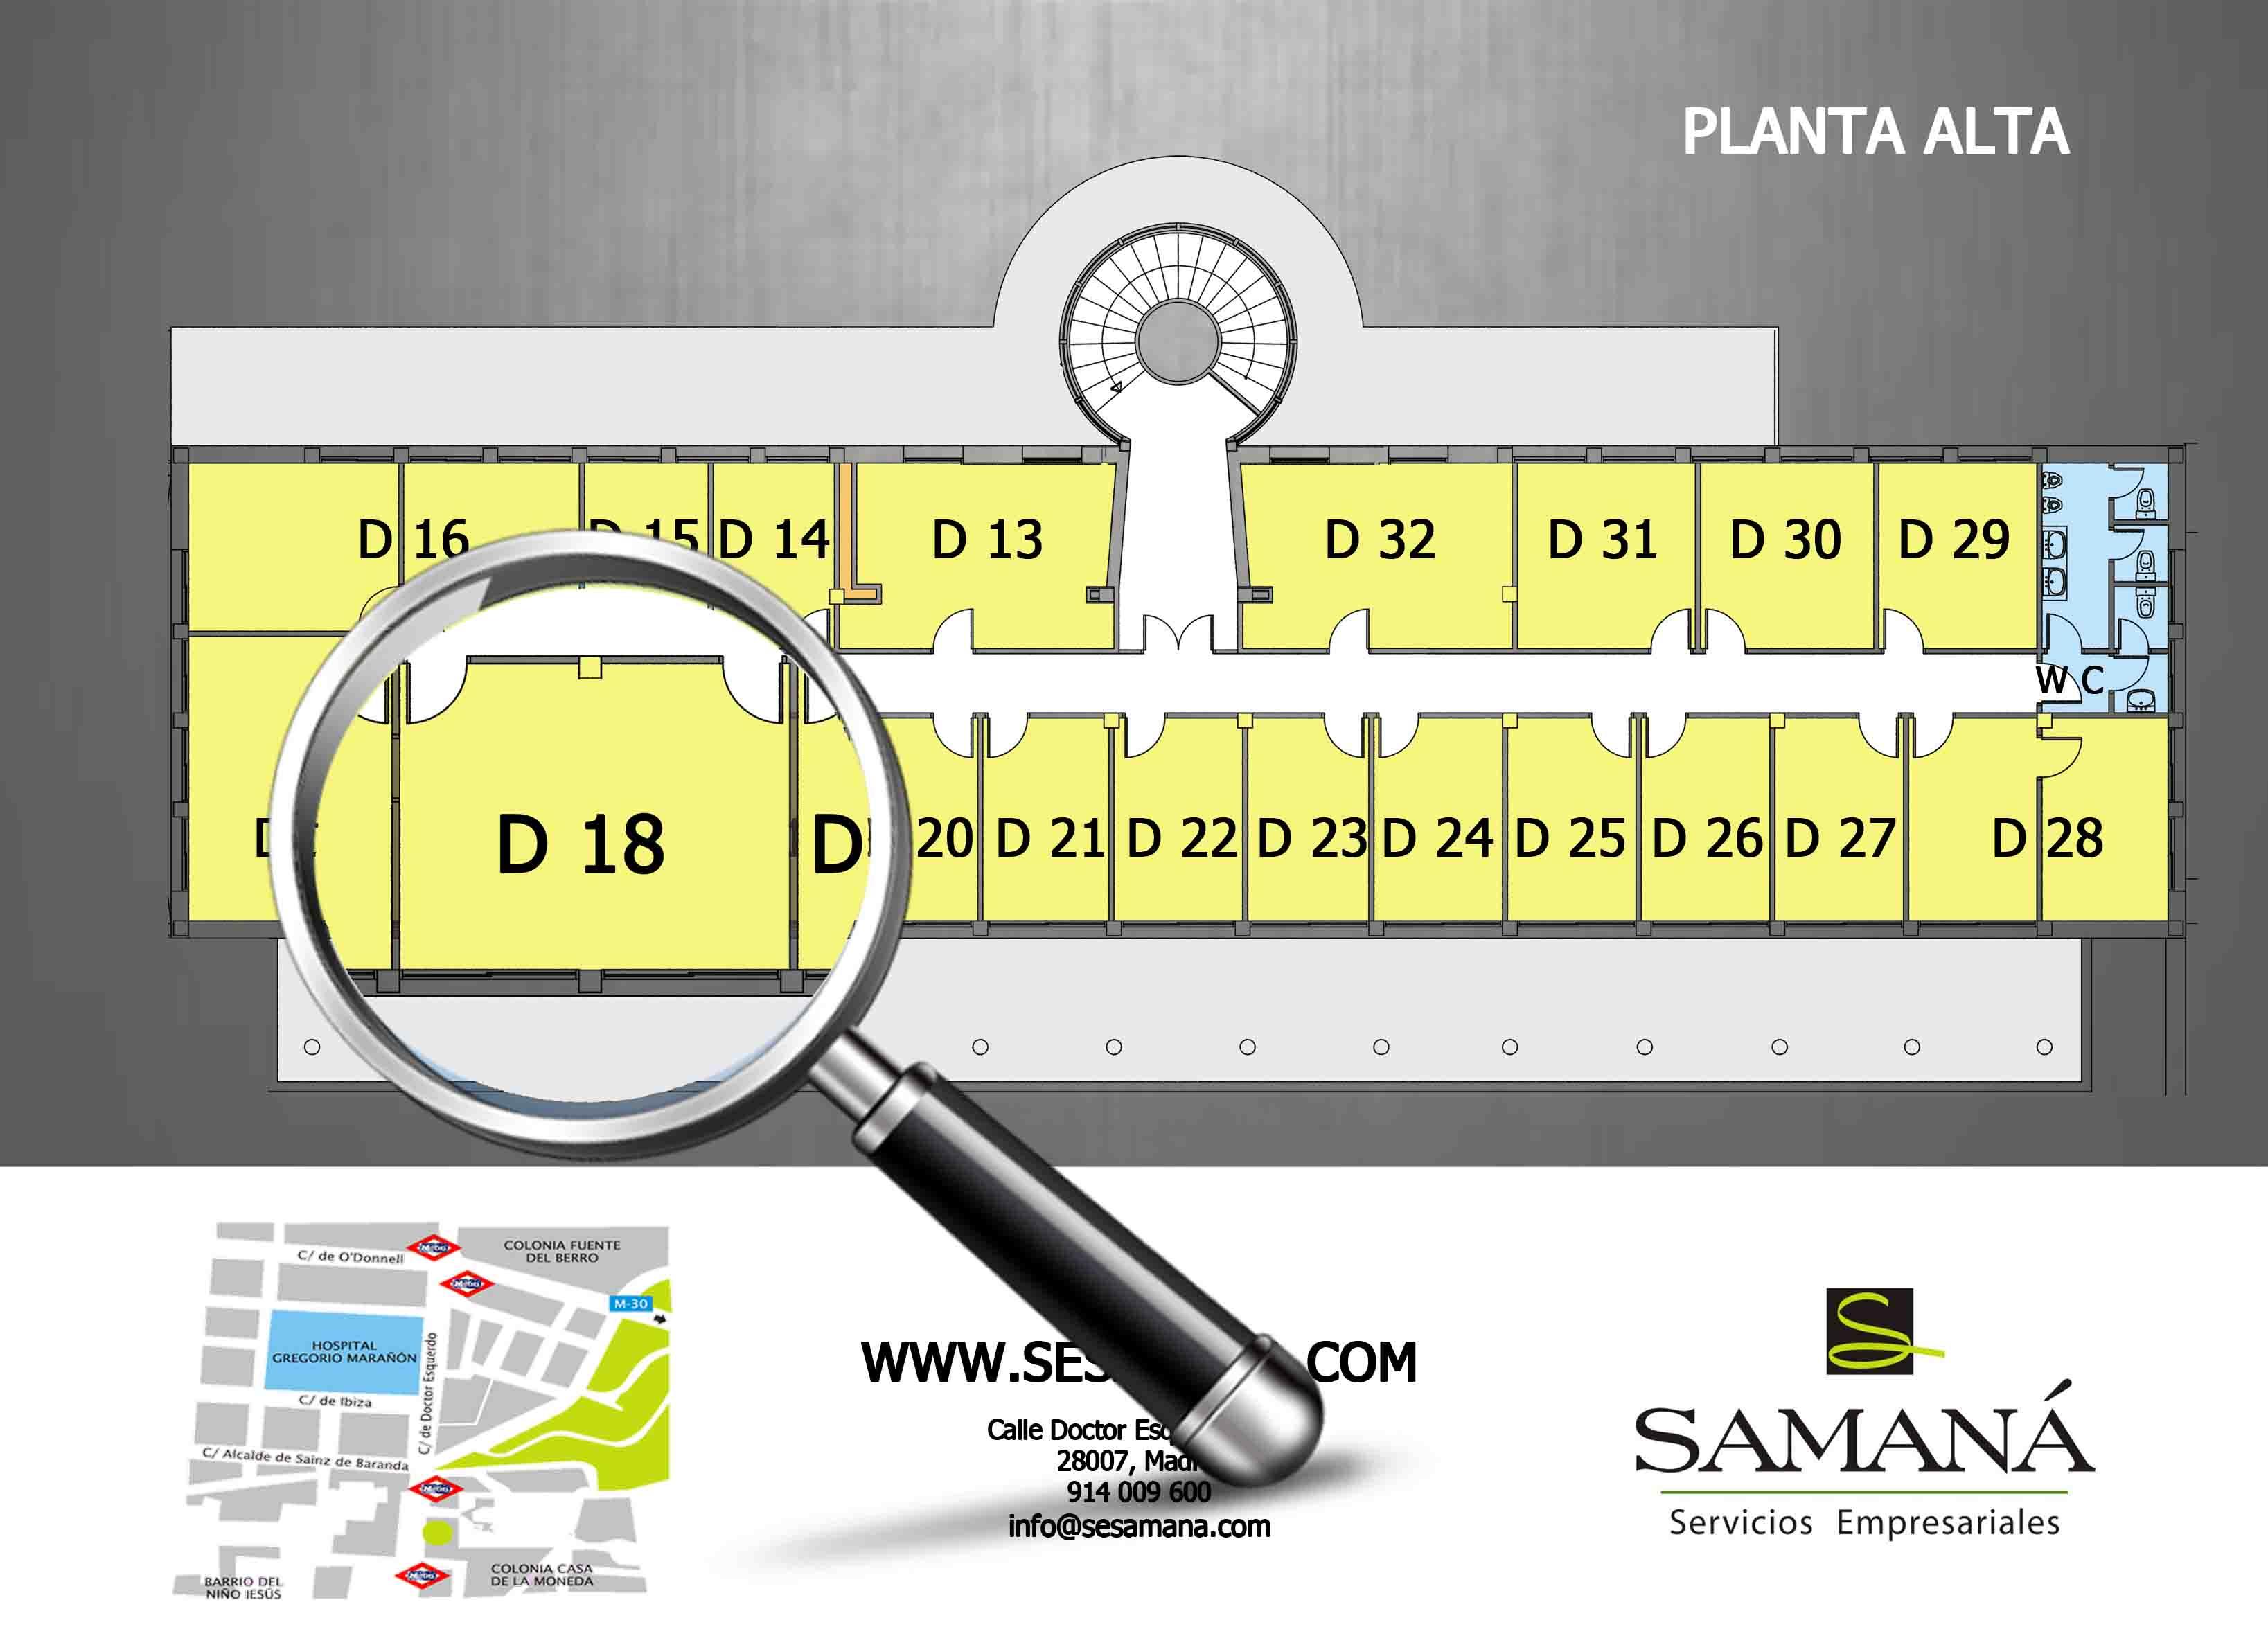 Z:#ABIERTOSEJECUTIVA SAMANAOFICINAS DOCTOR ESQUERDO 105EJECU